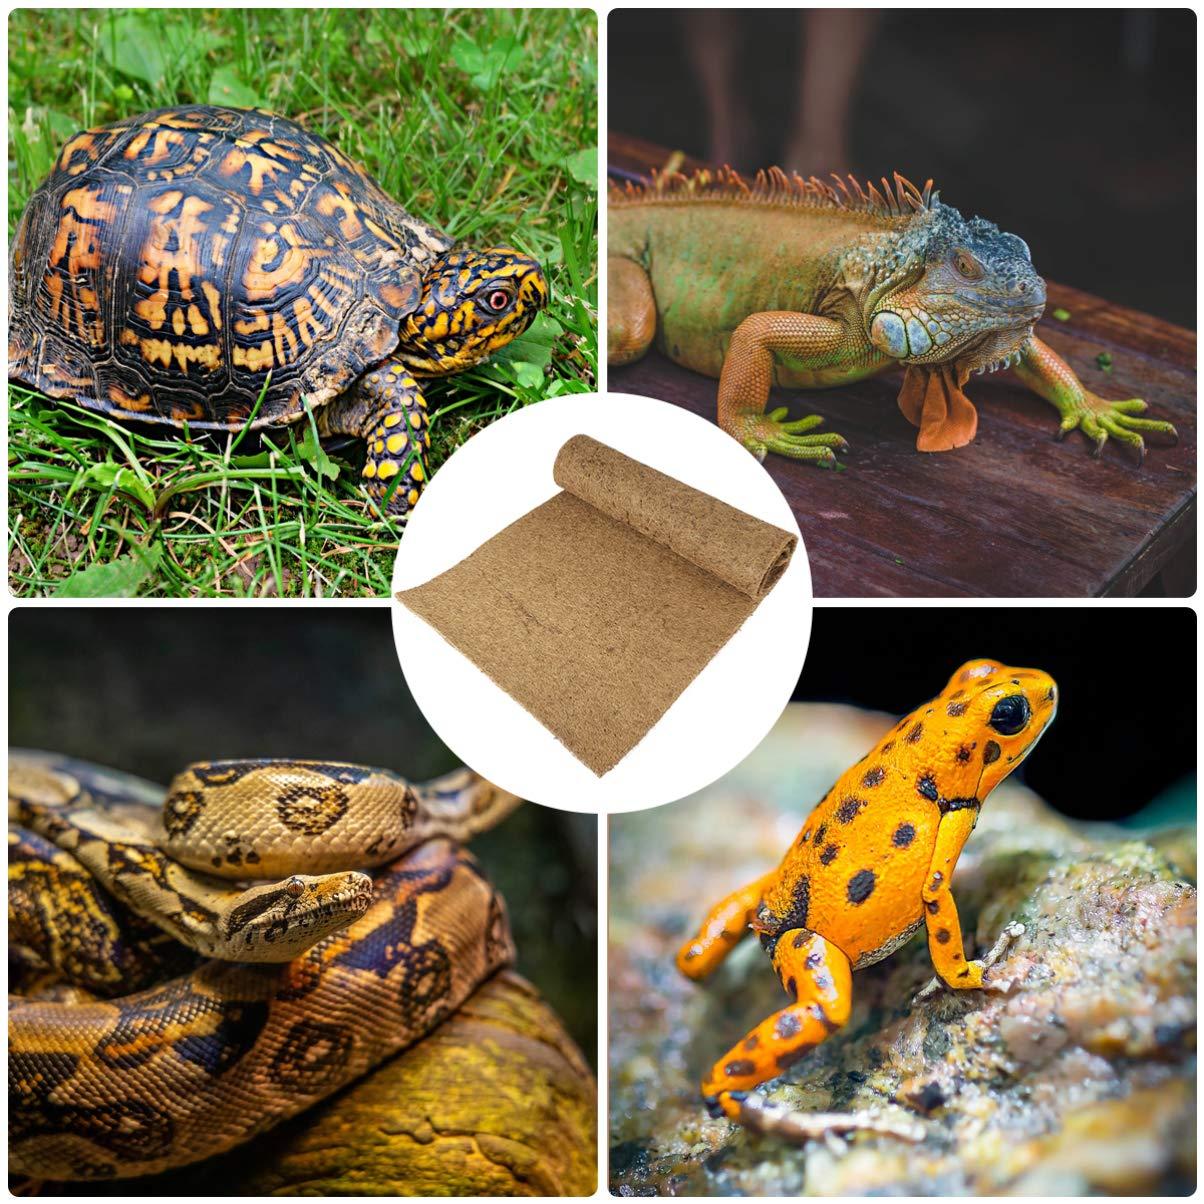 POPETPOP - Alfombra para reptiles (fibra de coco natural, 100 x 40 cm): Amazon.es: Productos para mascotas